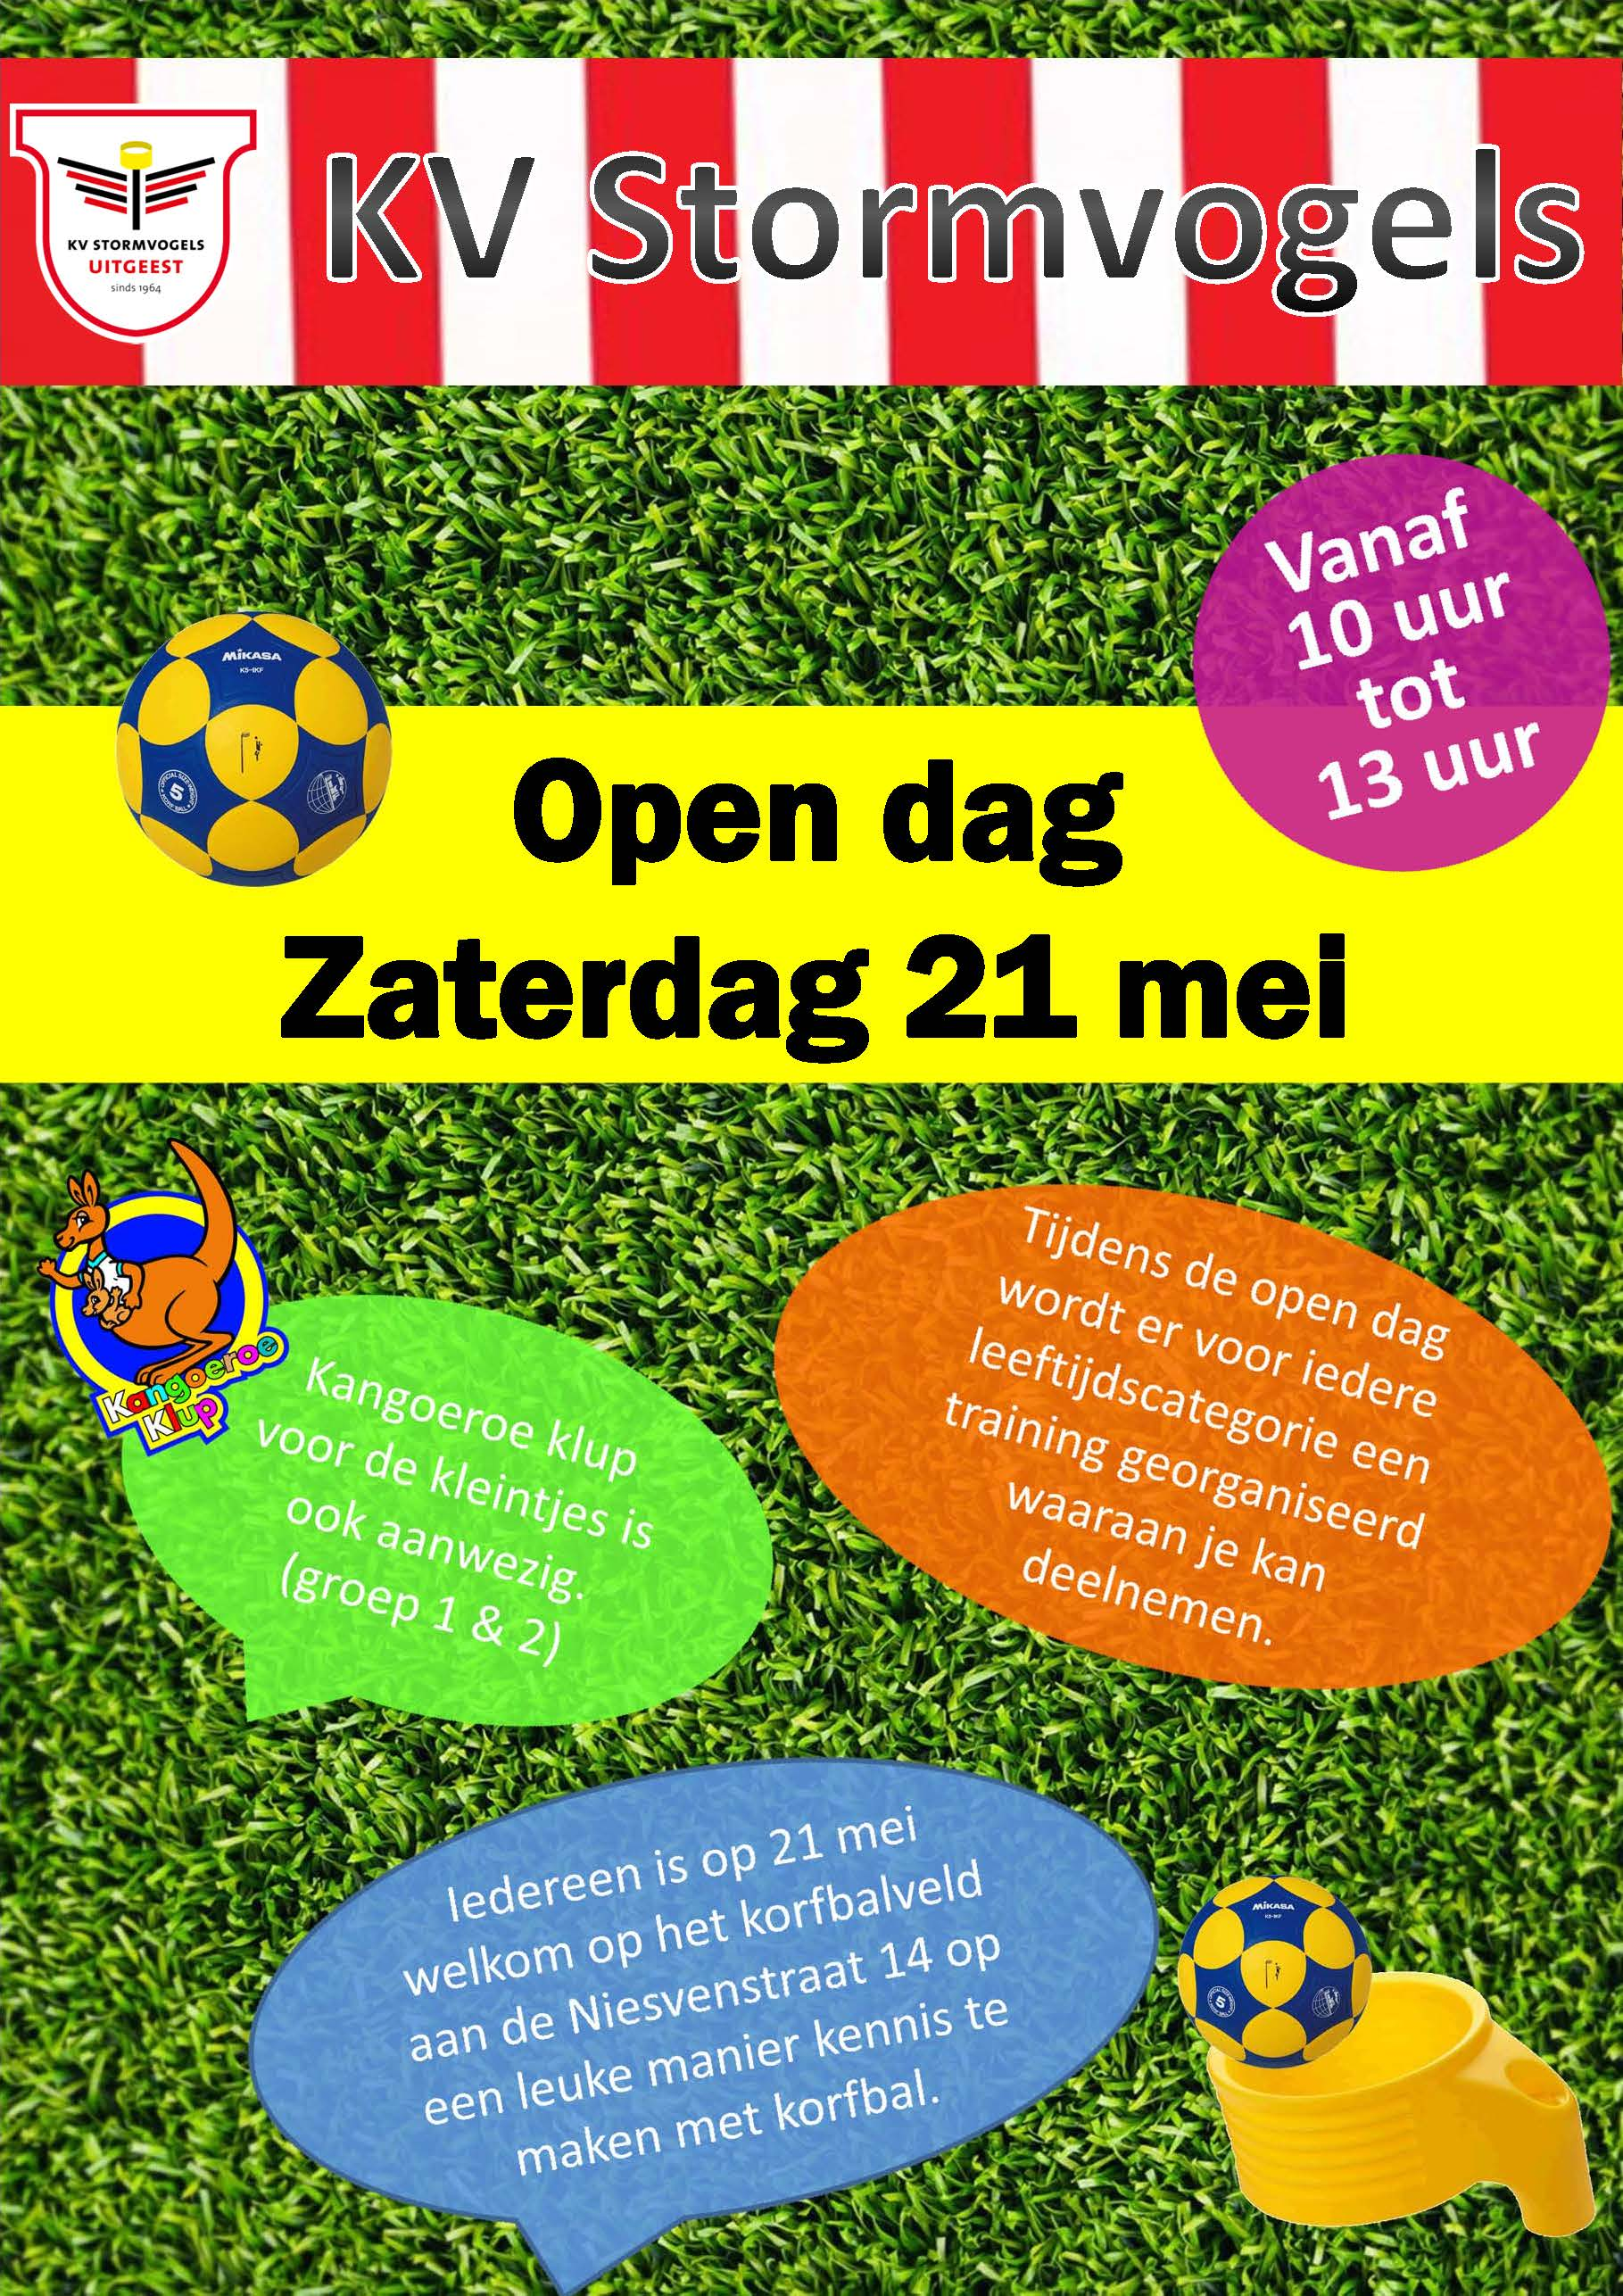 Open dag zaterdag 21 mei.